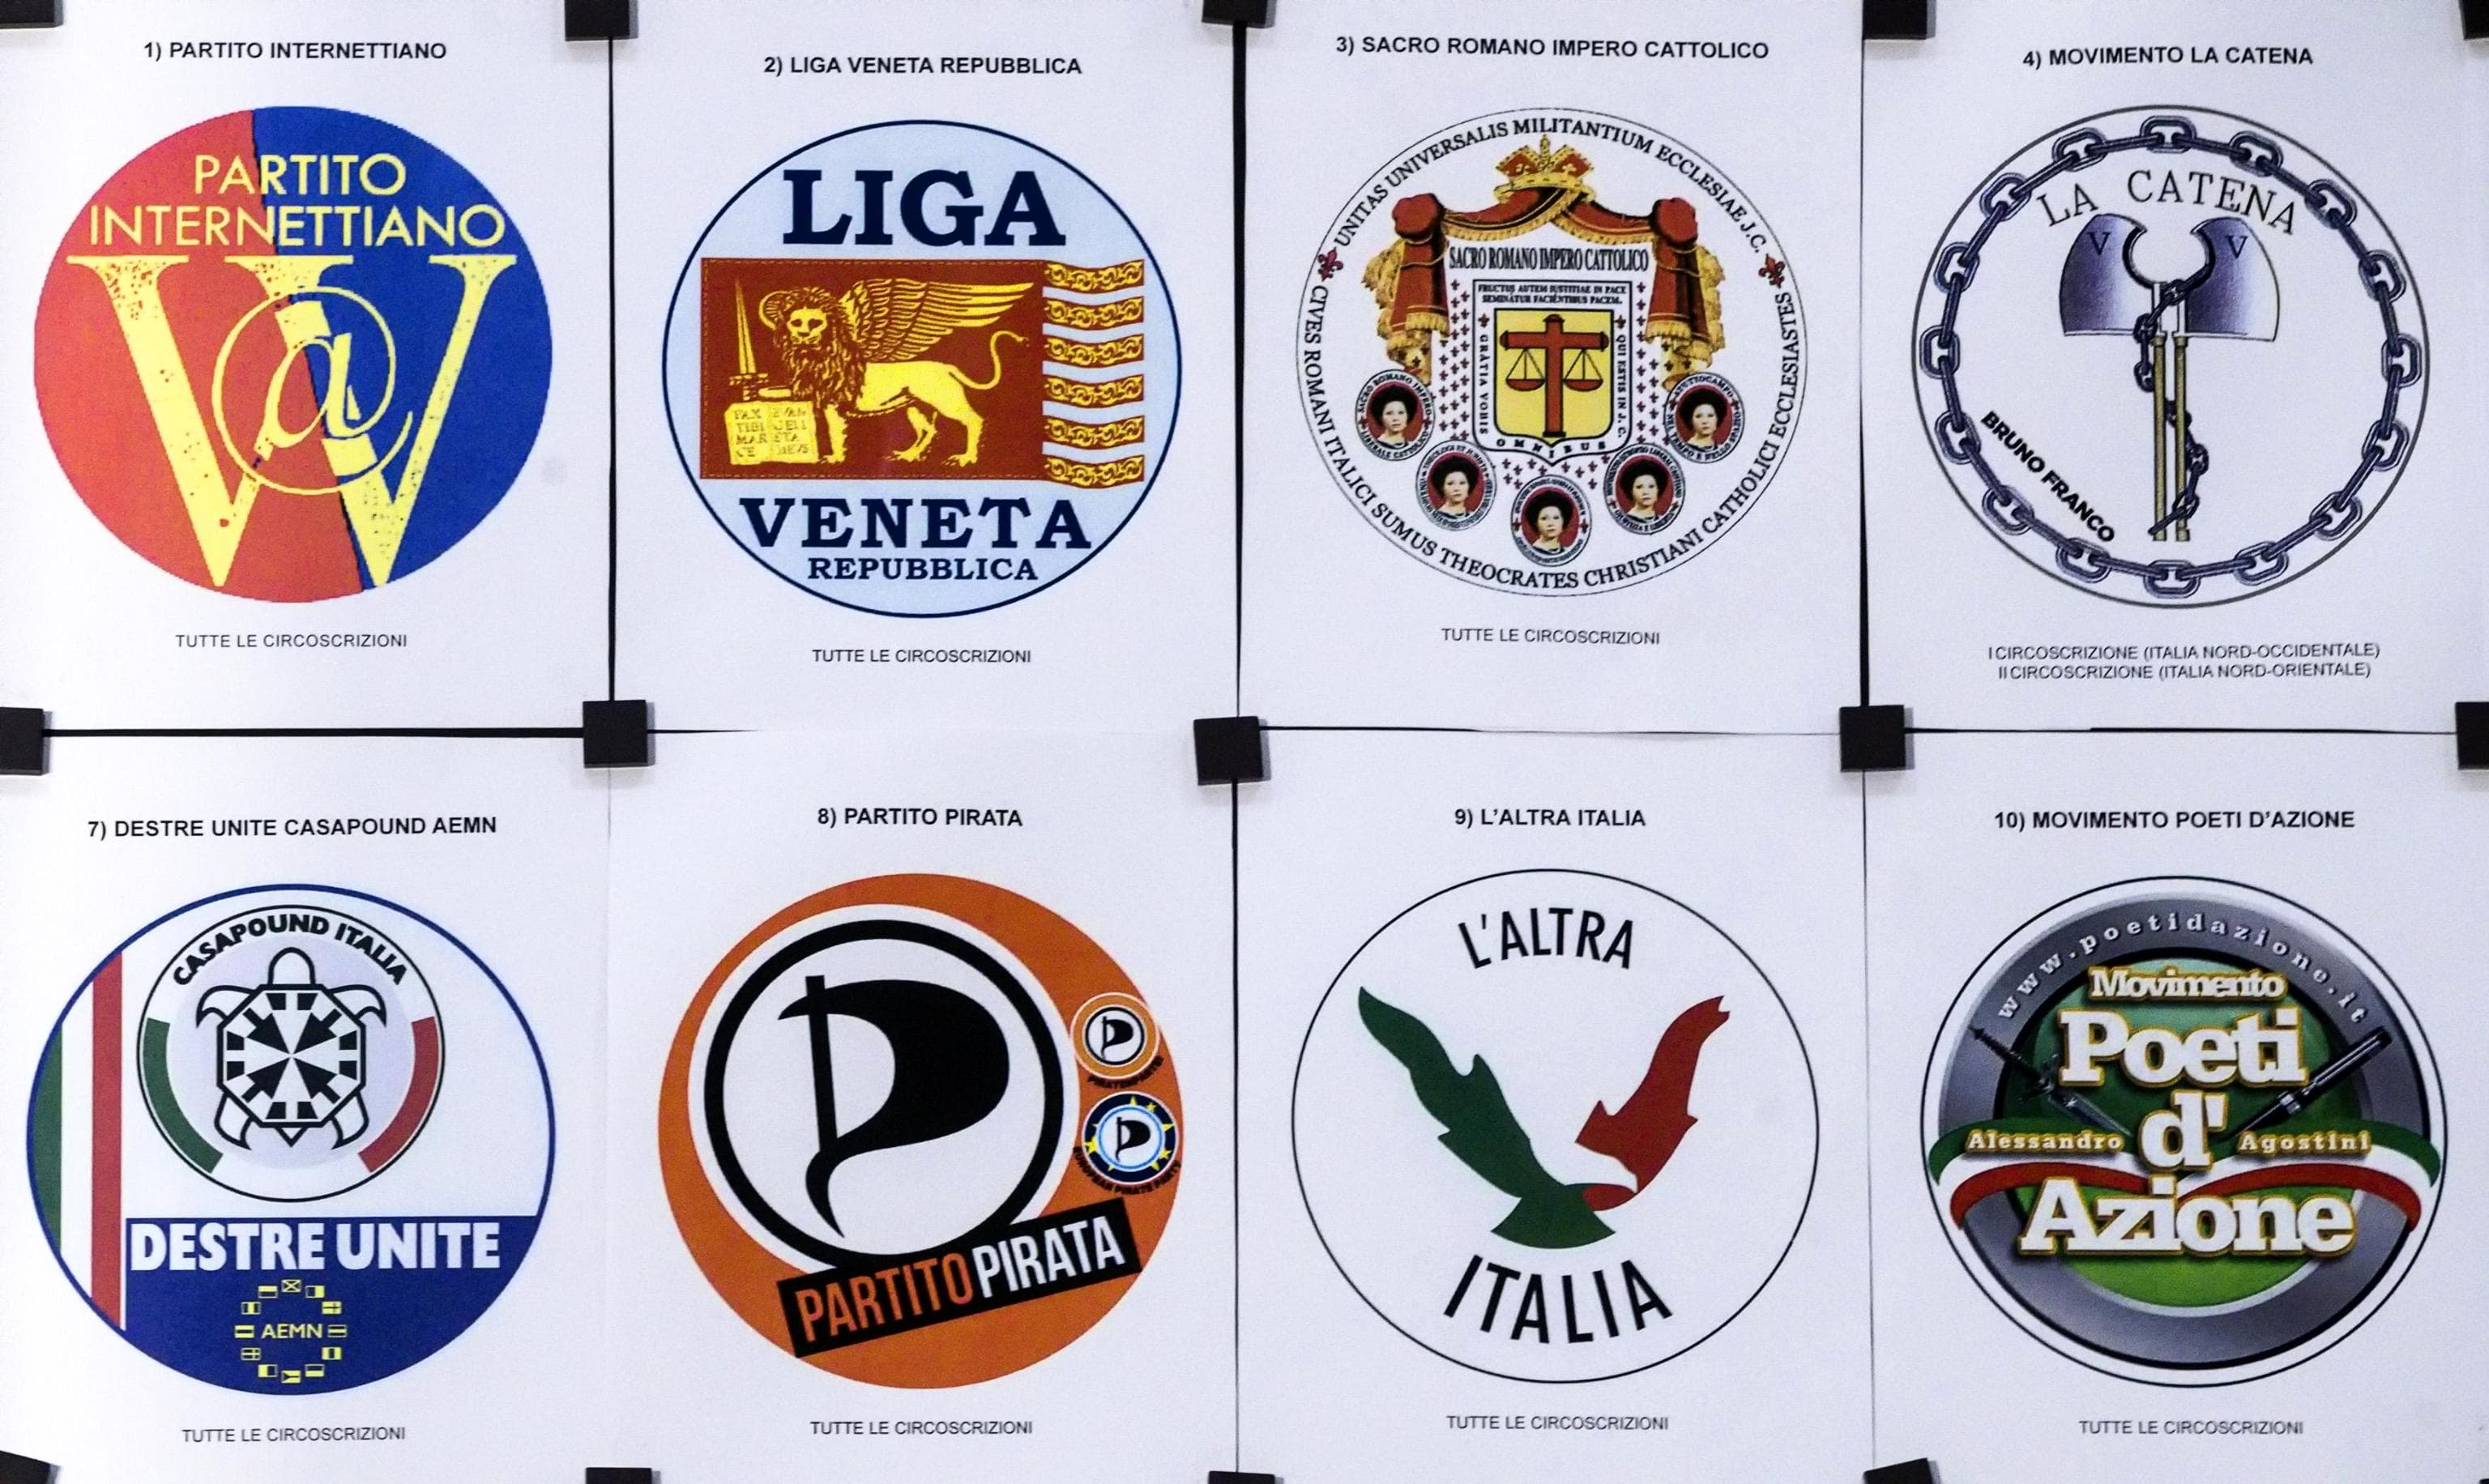 simboli strani elettorali europee-2